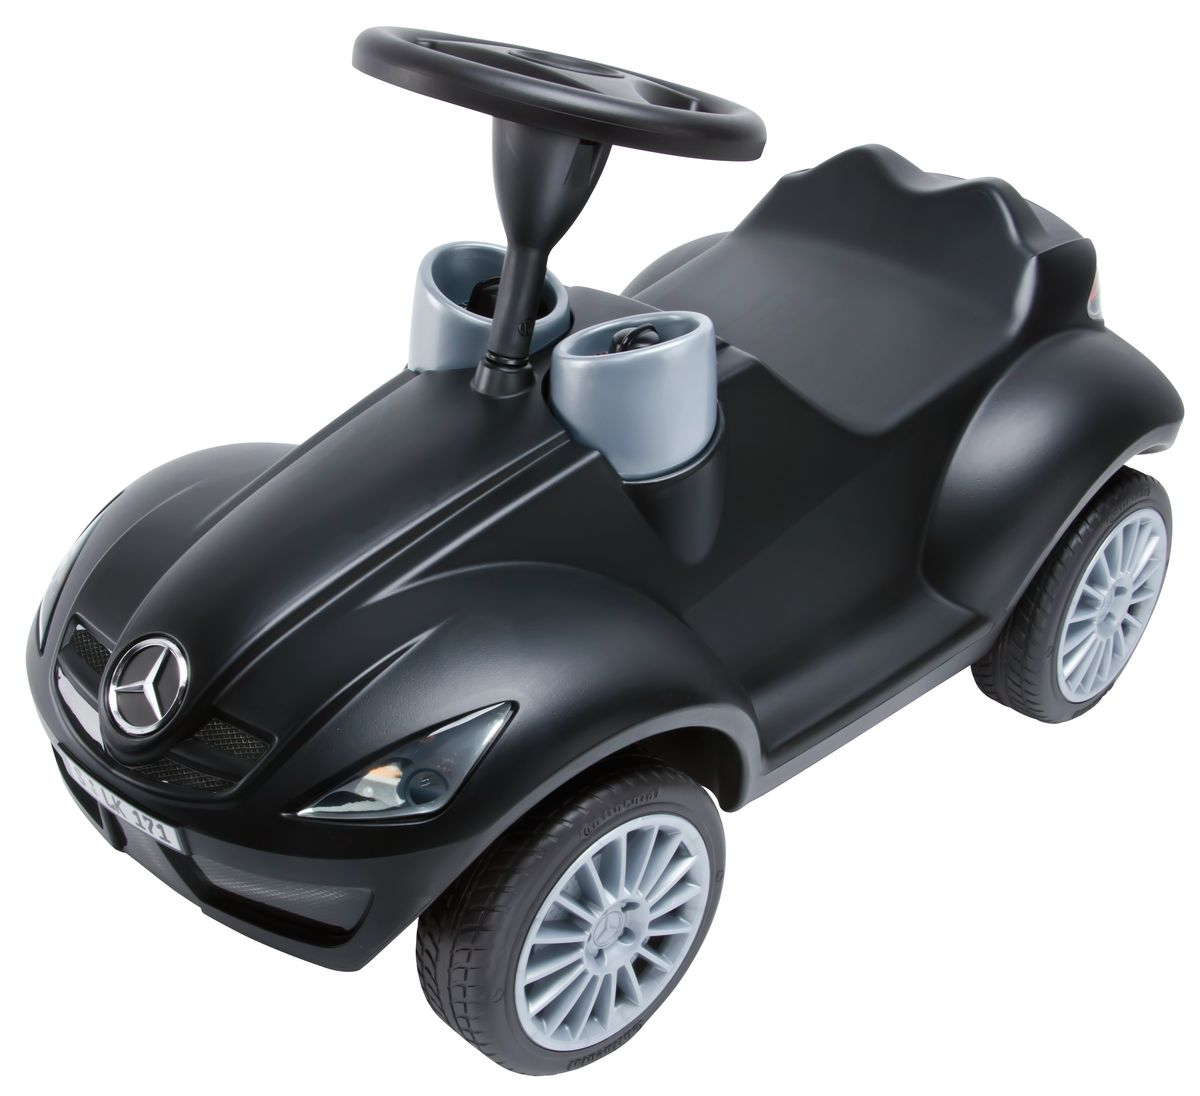 Big Машинка SLK-Bobby-Benz